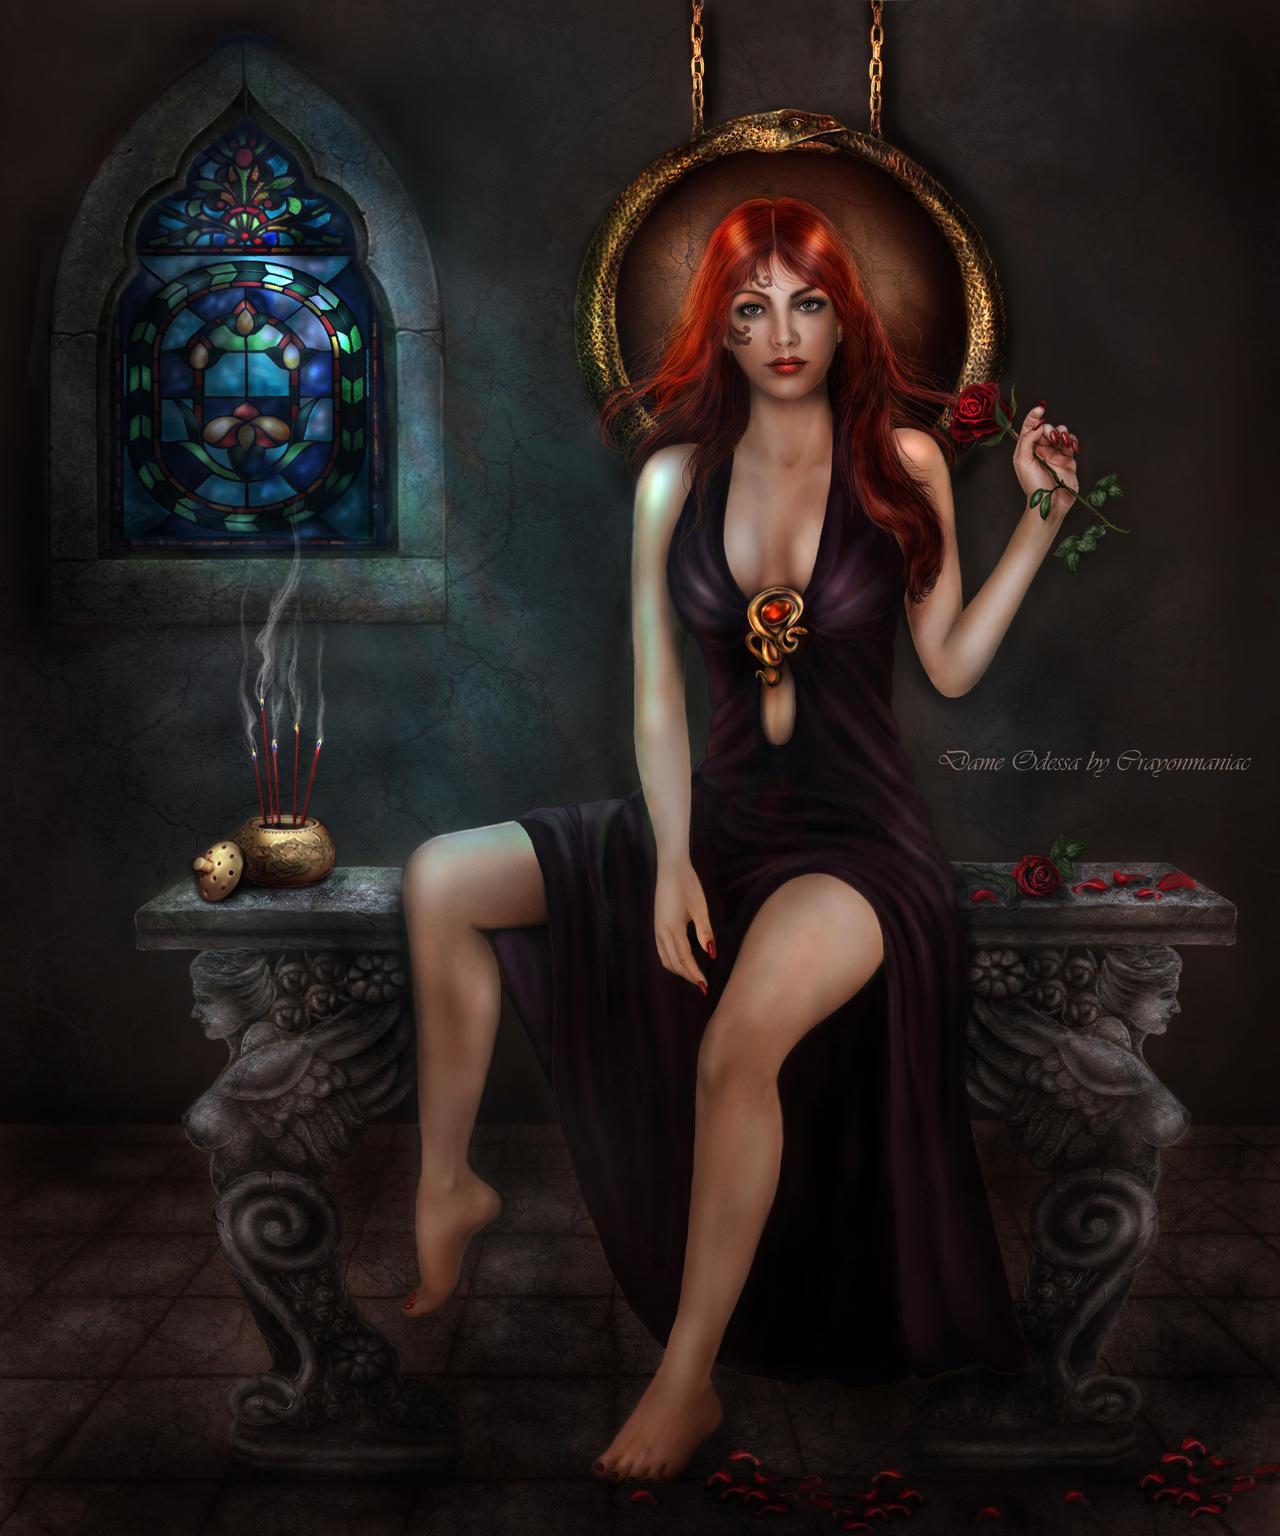 Dame Odessa by crayonmaniac